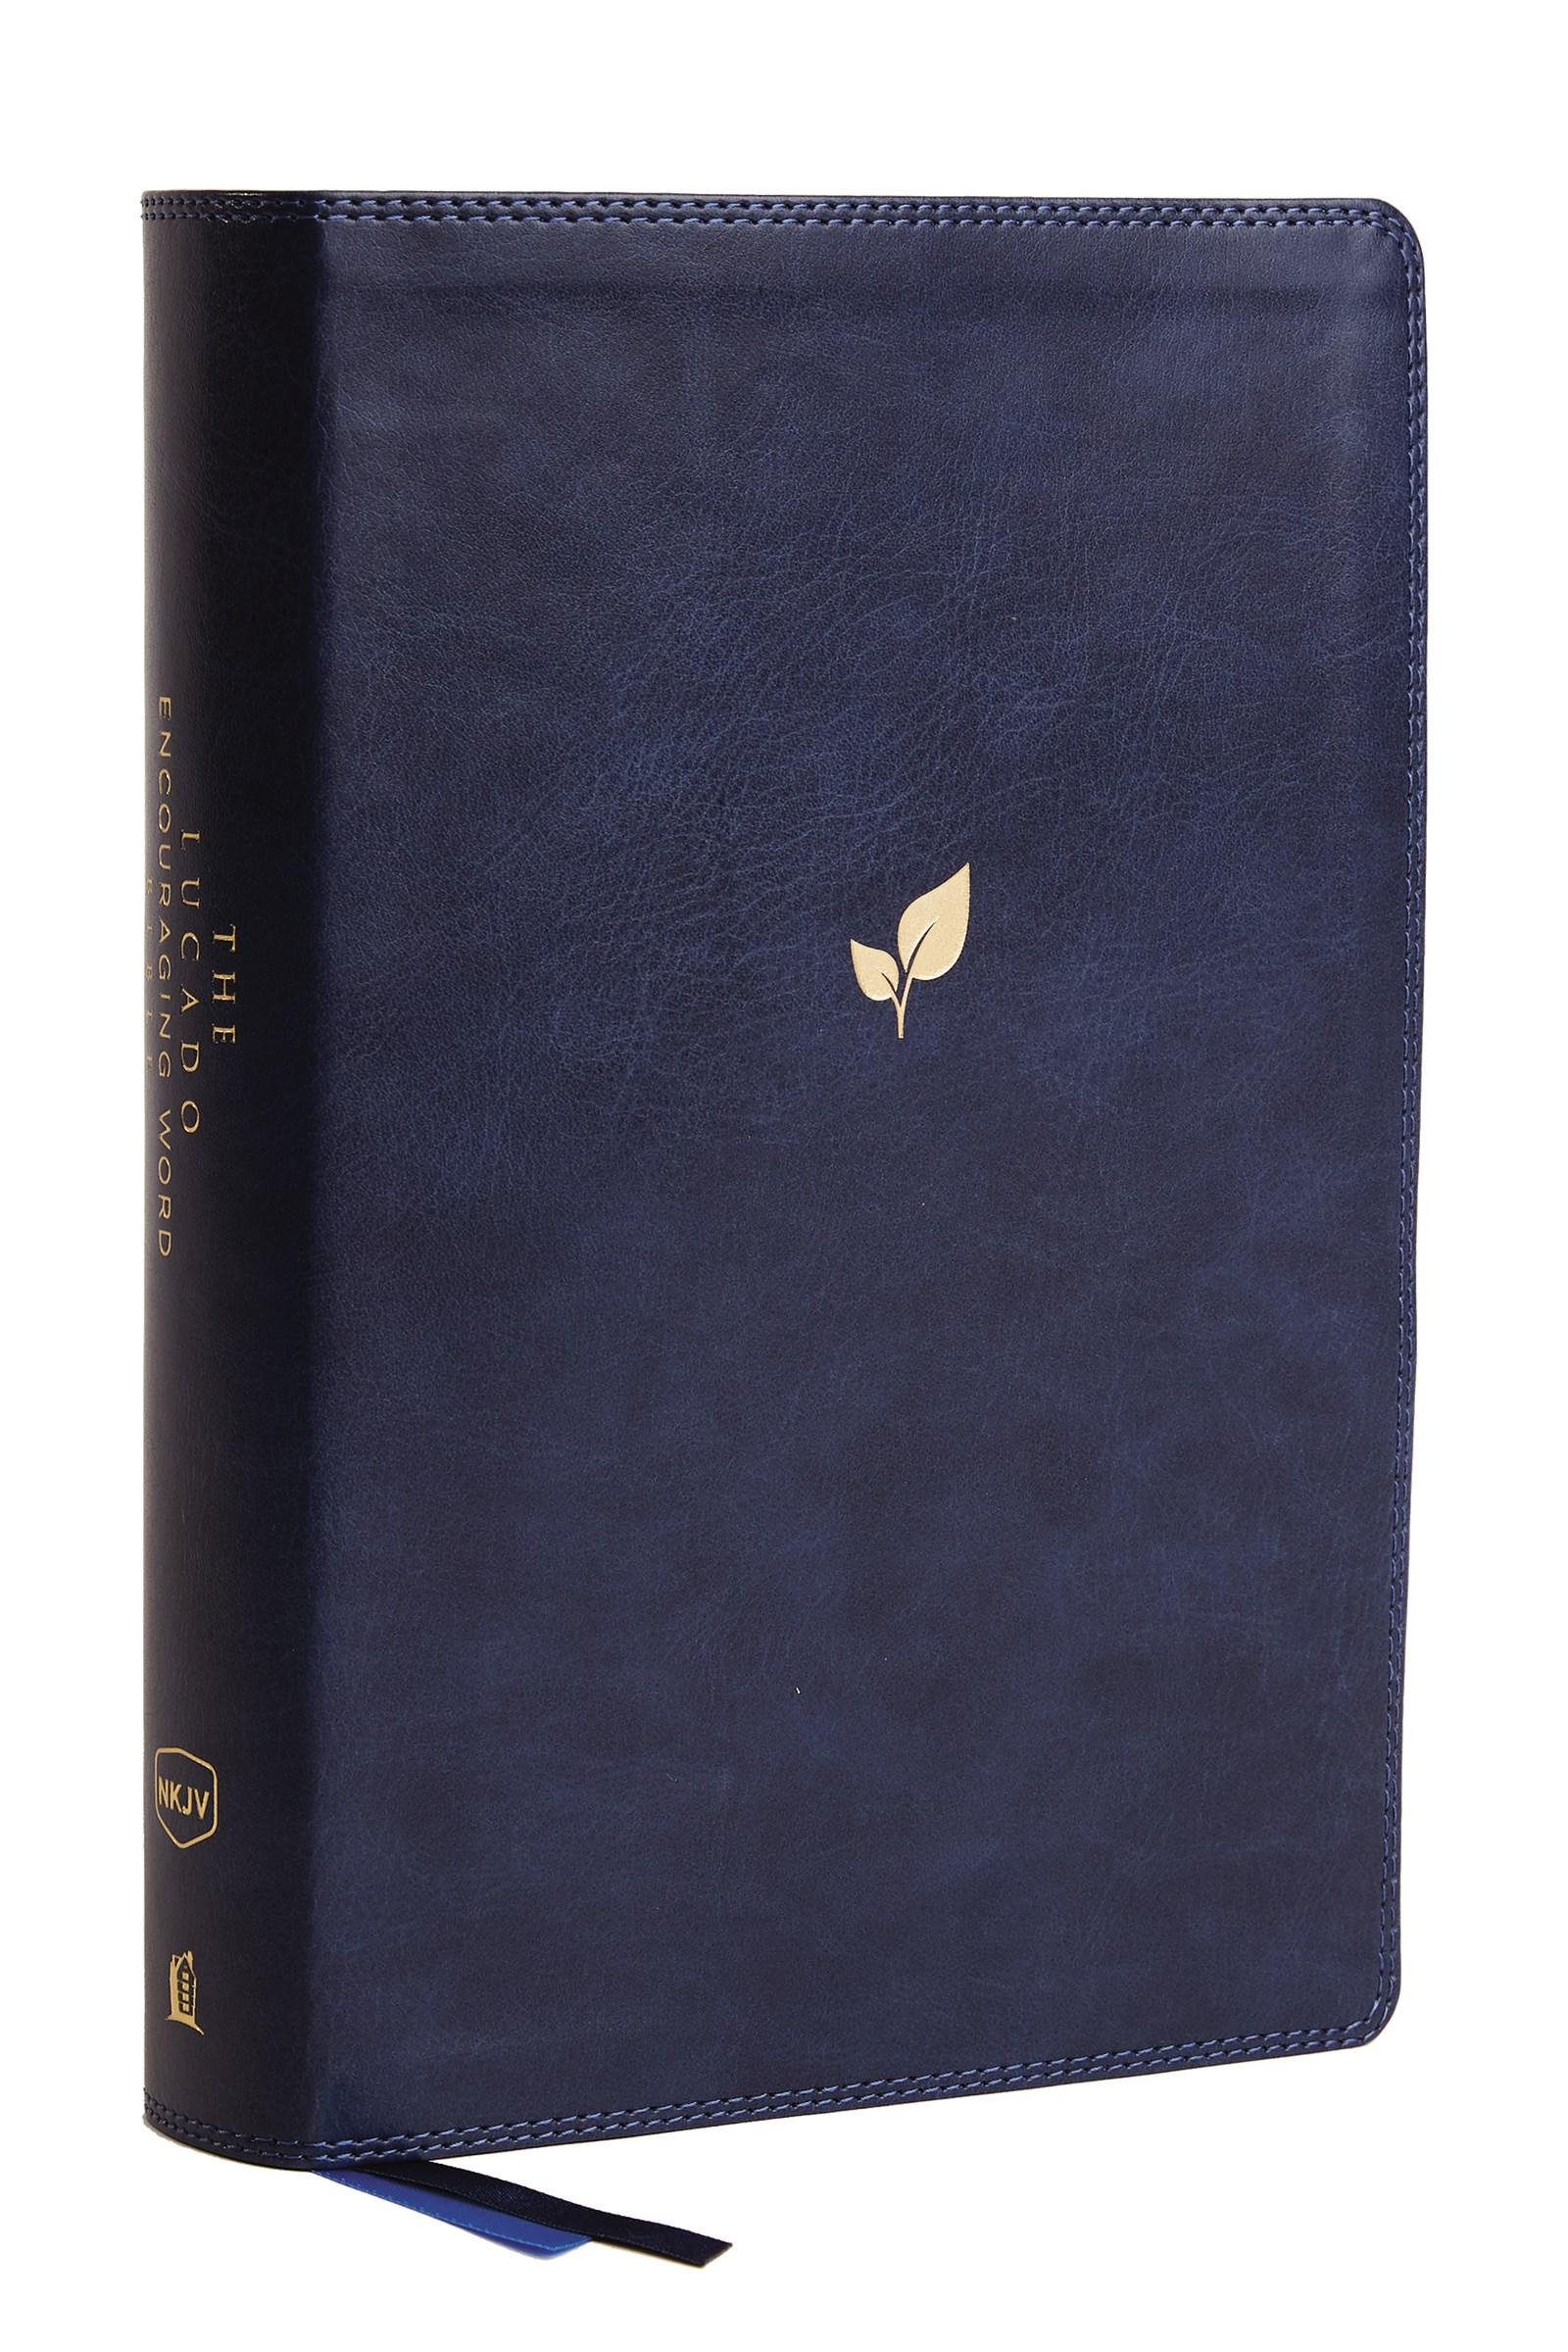 NKJV Lucado Encouraging Word Bible (Comfort Print)-Blue Leathersoft